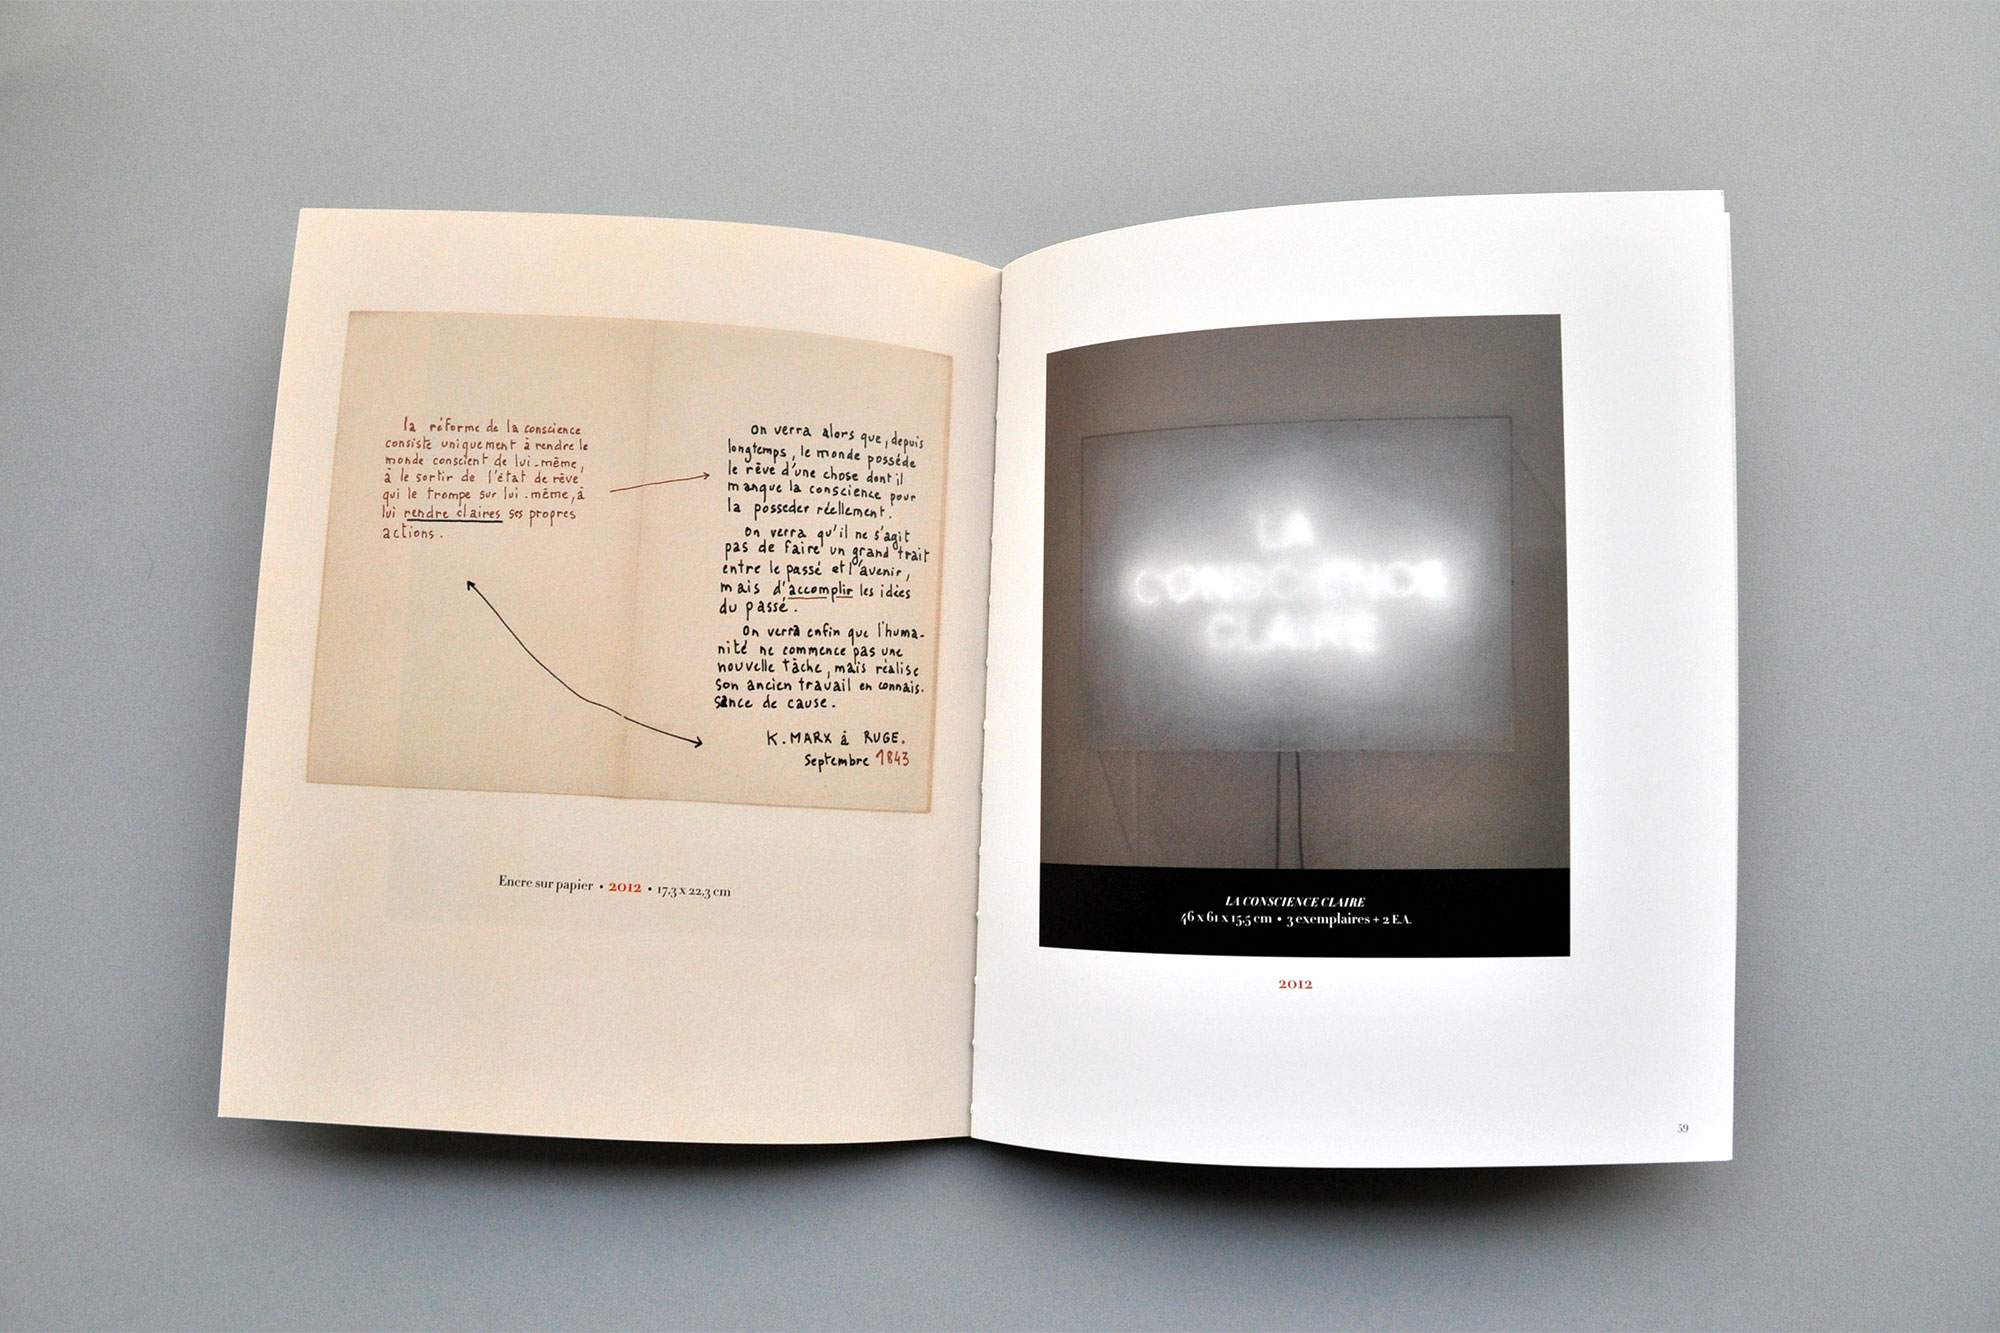 narrative edition livre Jean Michel alberola